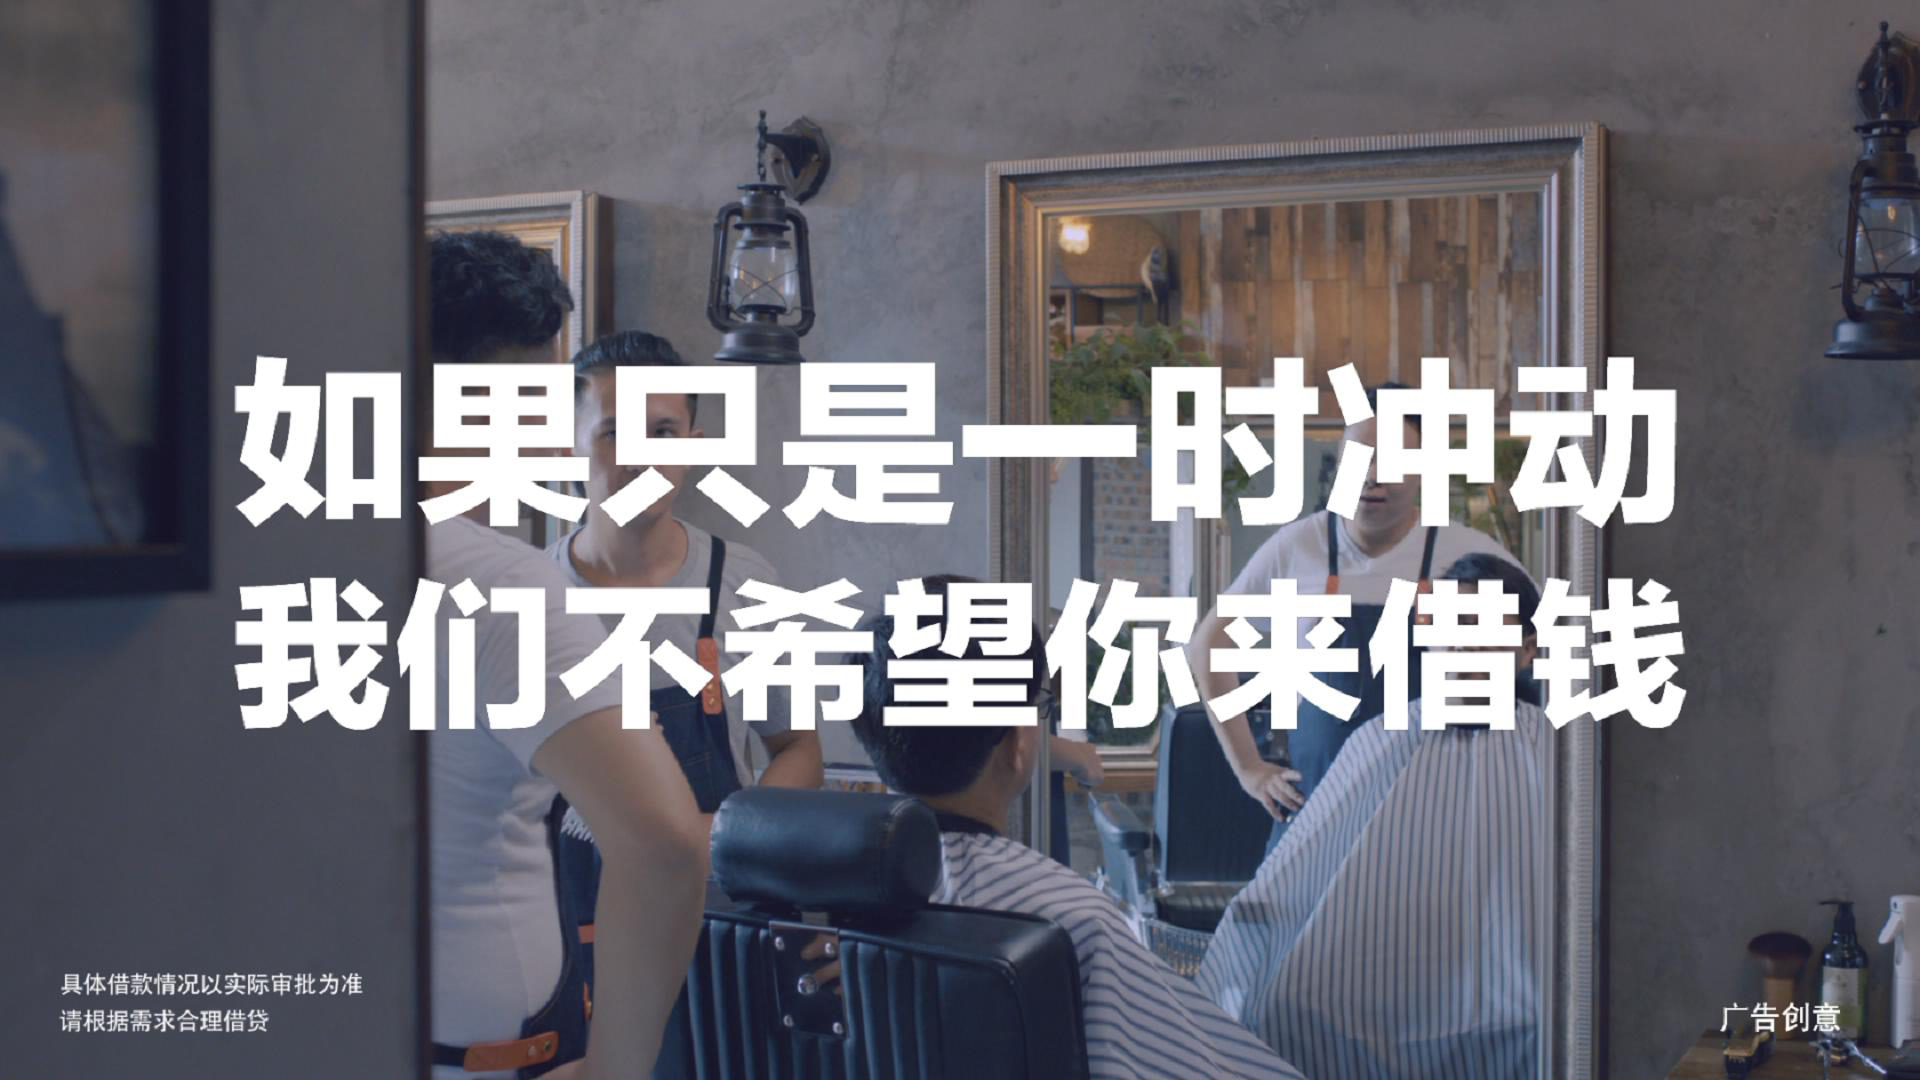 2019_cn_2019_e191-fn-160131894_hero_1